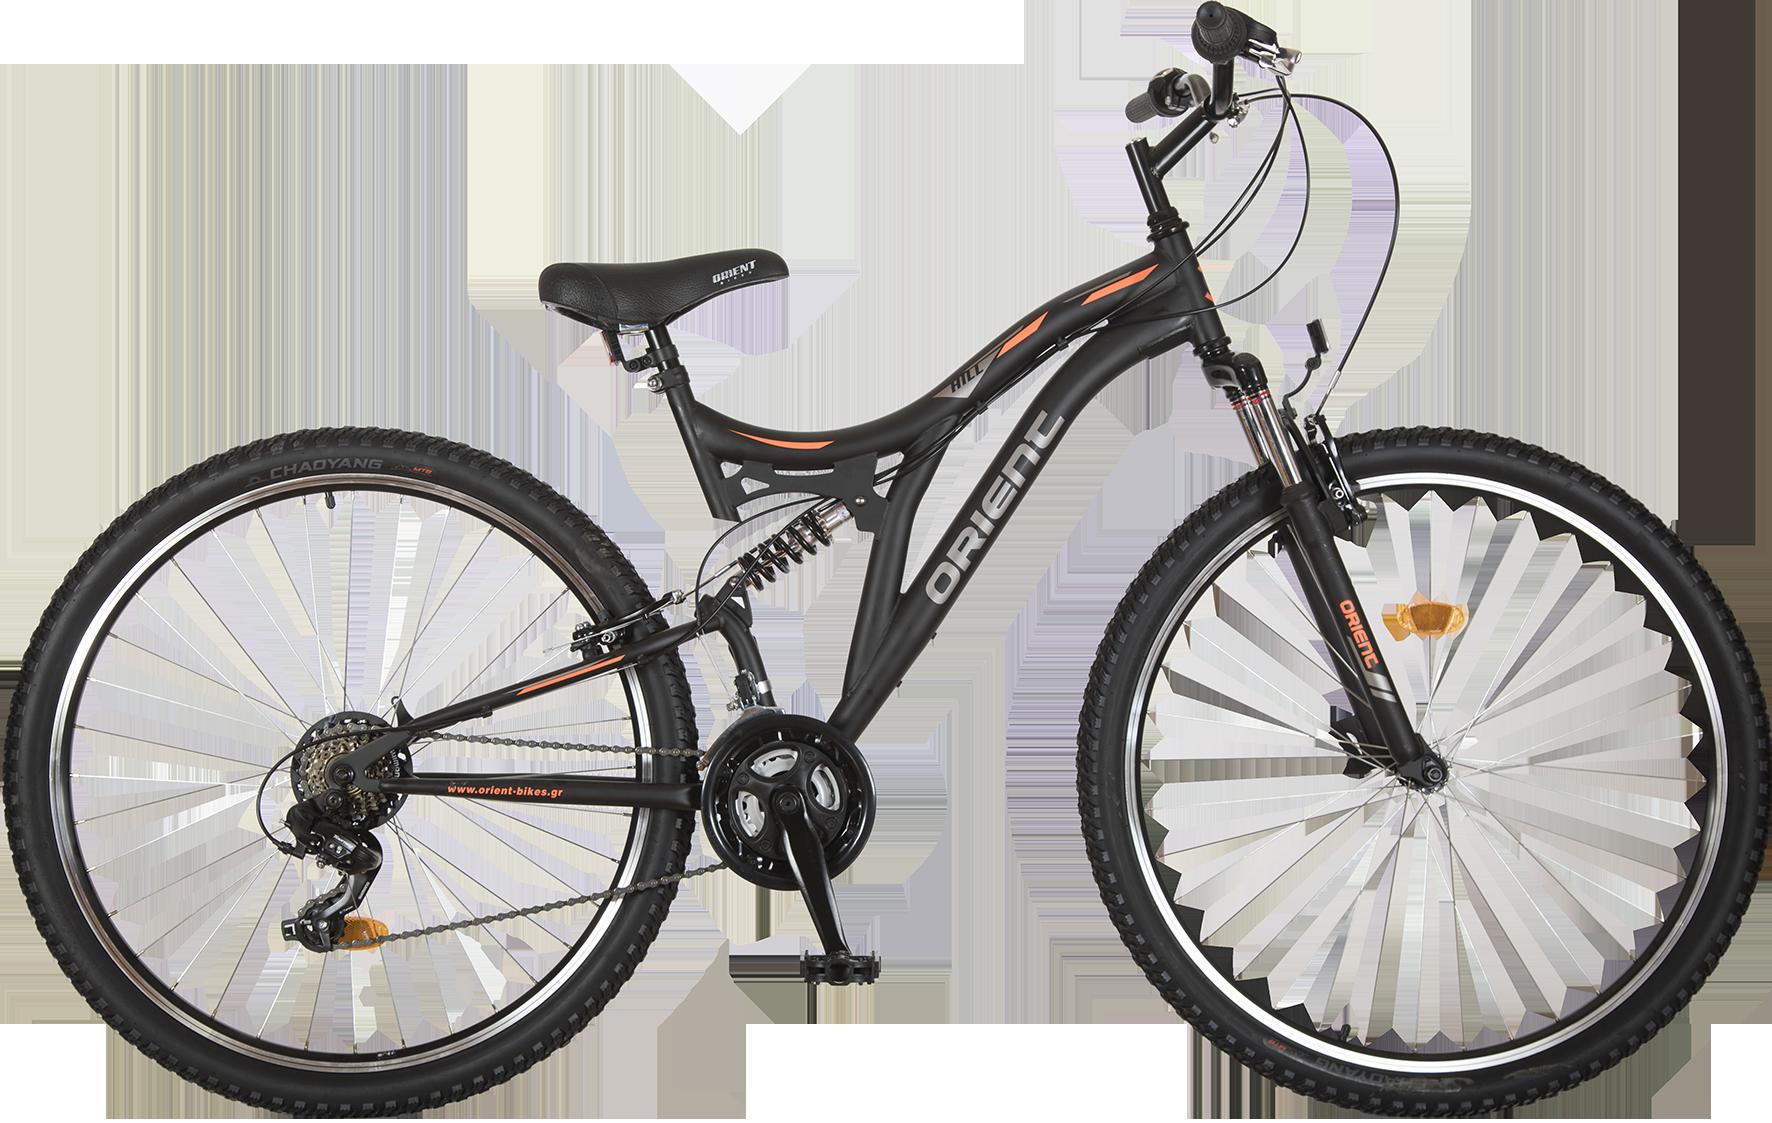 HILL 29″  21sp. bike image